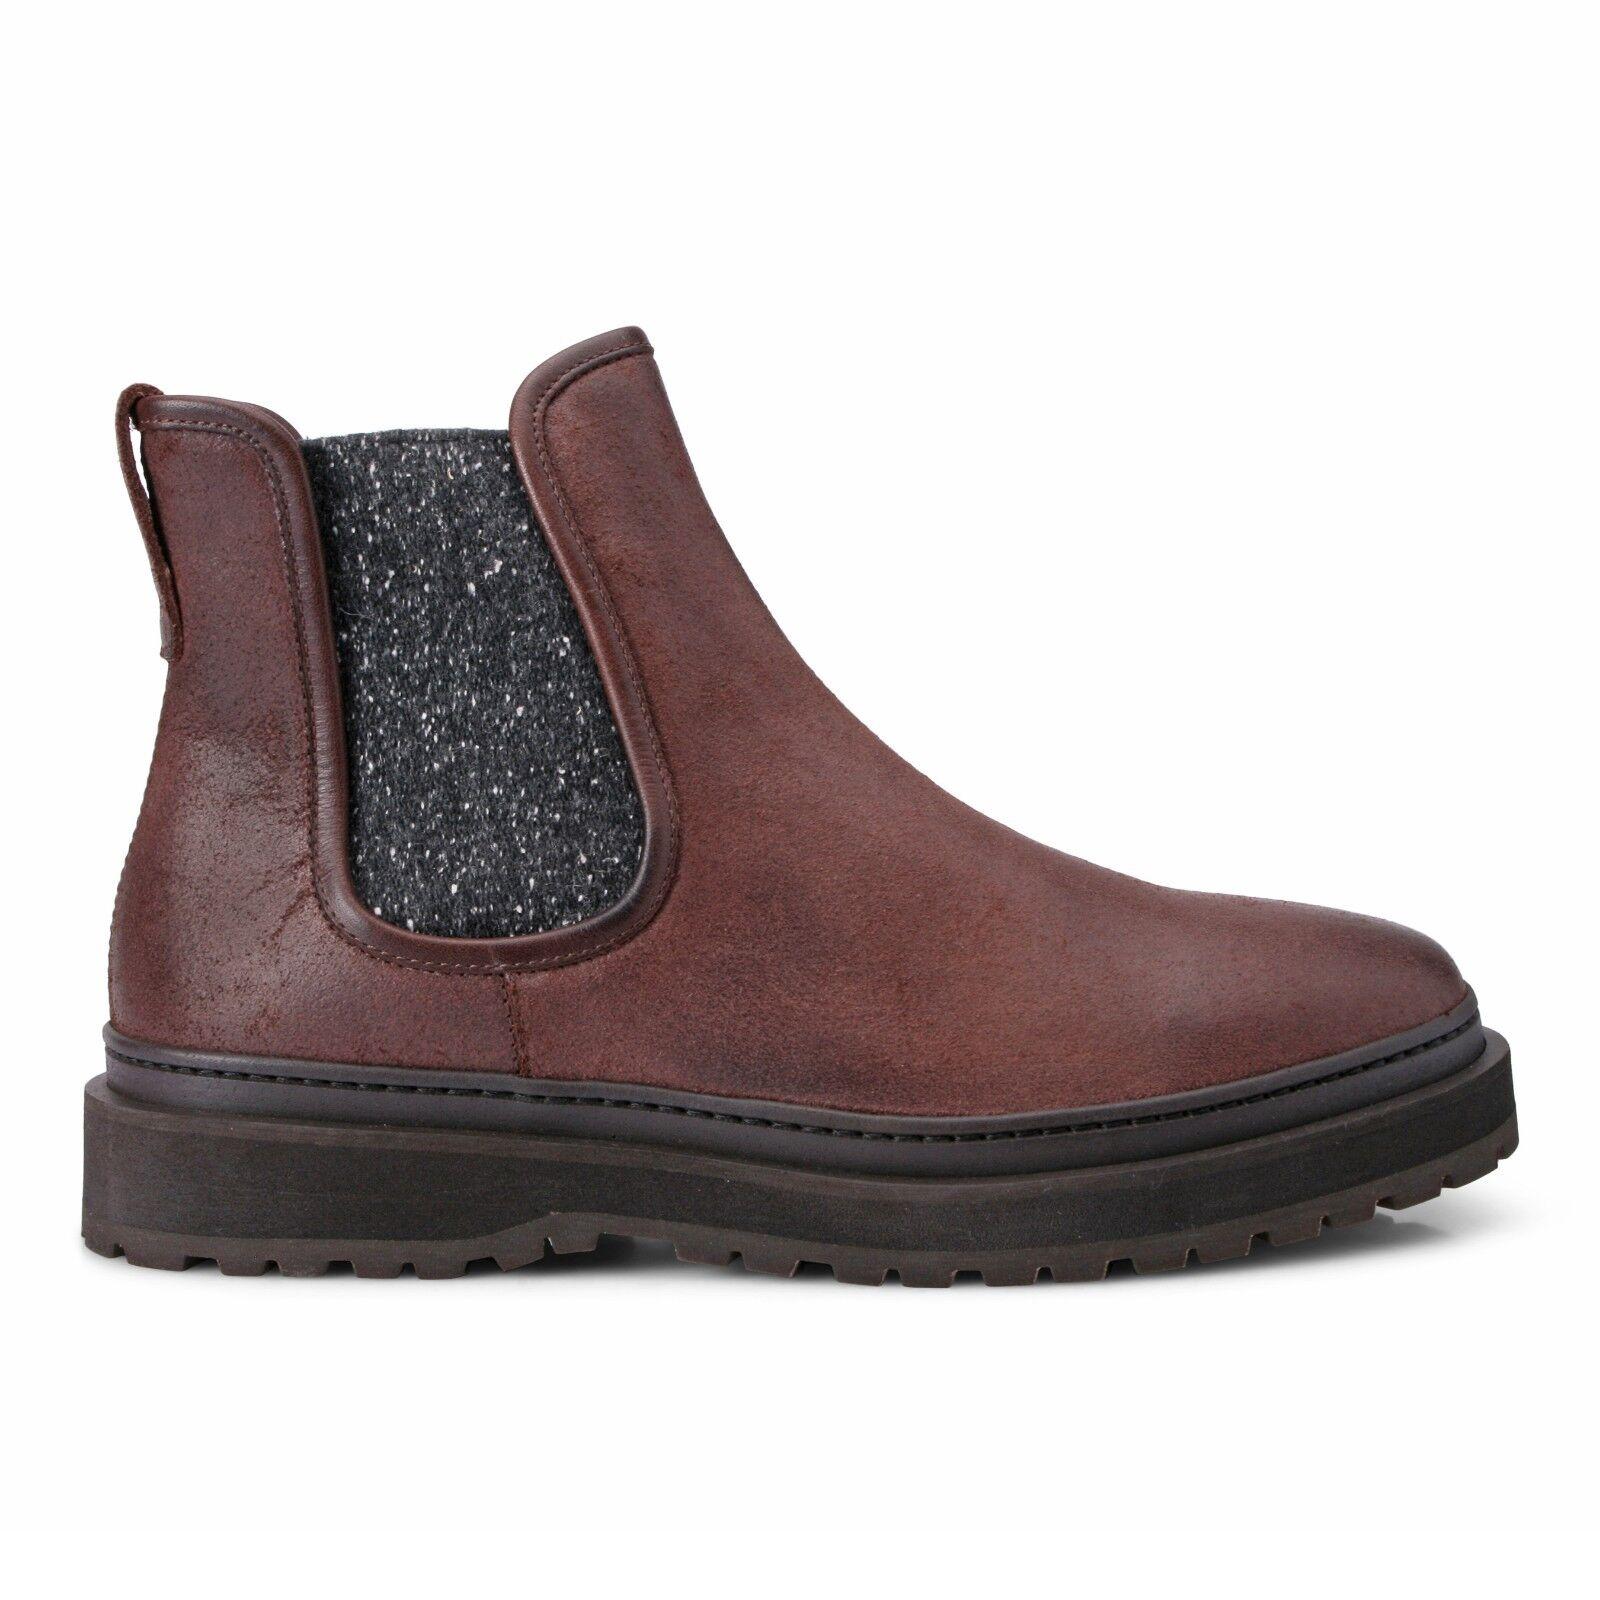 Brunello Cucinelli Men's brown leather cashmerre Boots shoes NEW Sizes 9